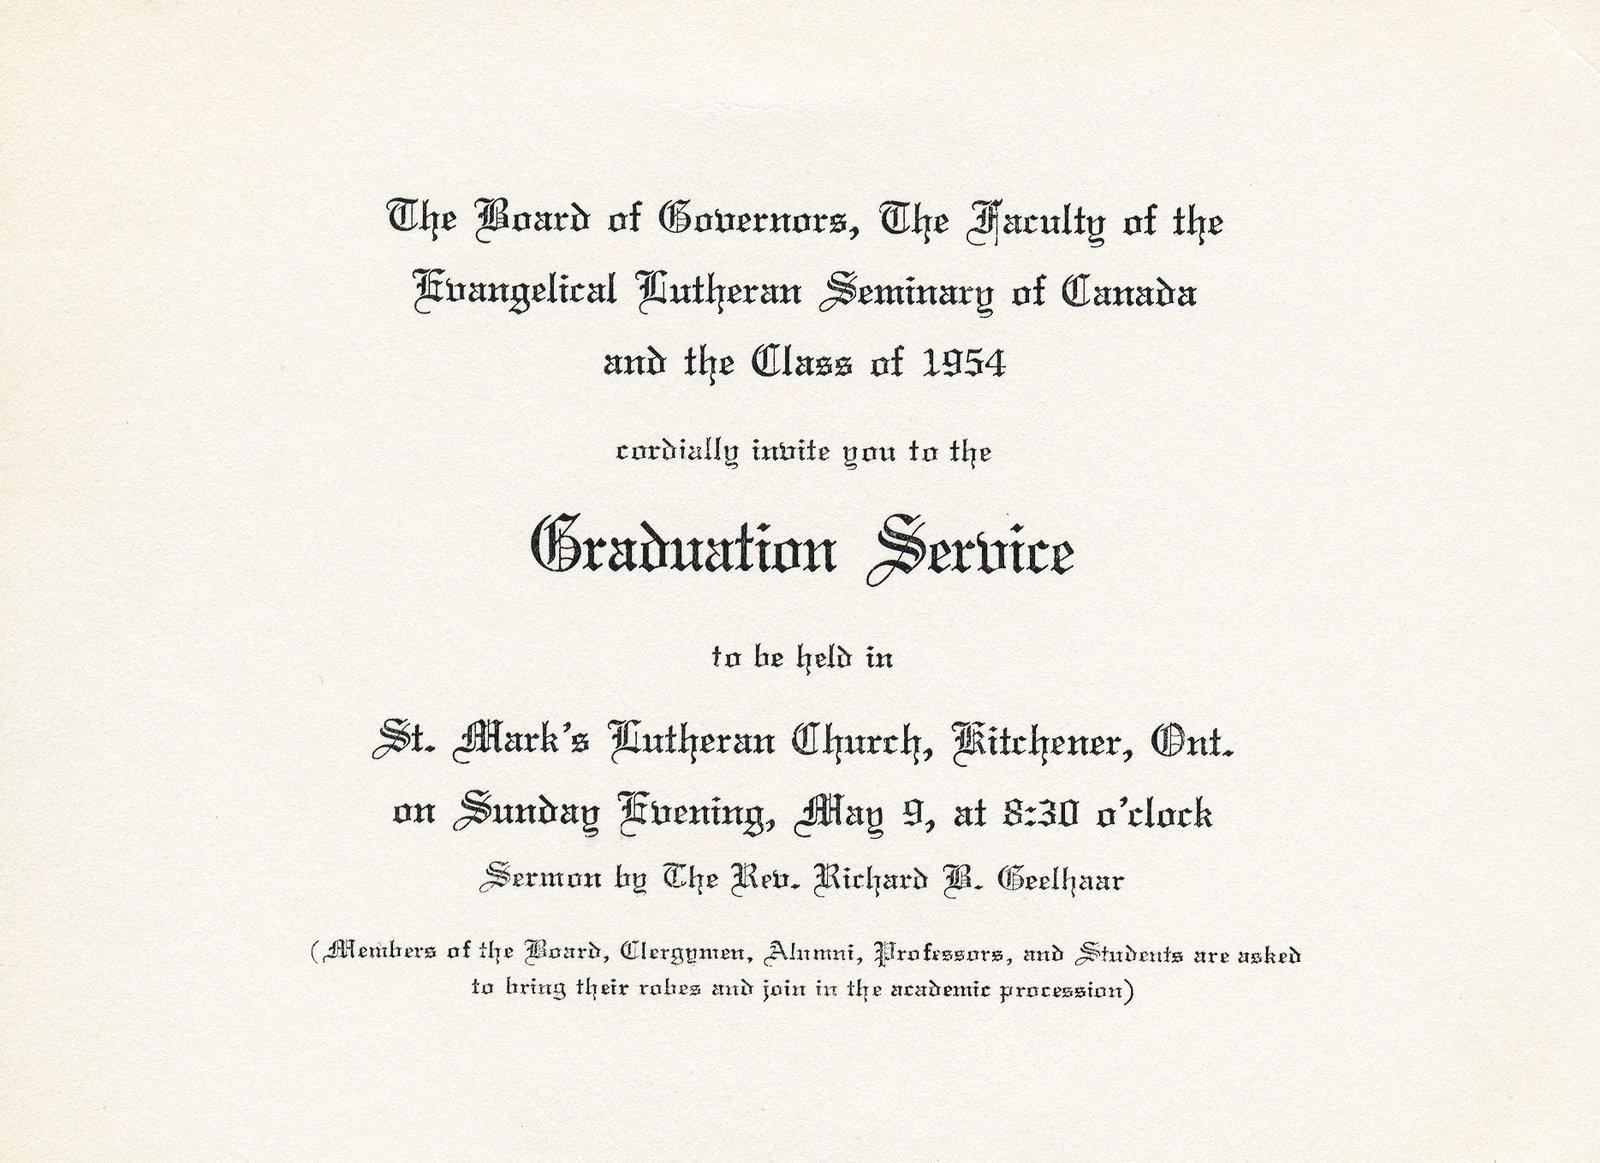 Evangelical Lutheran Seminary of Canada graduation service invitation, 1954